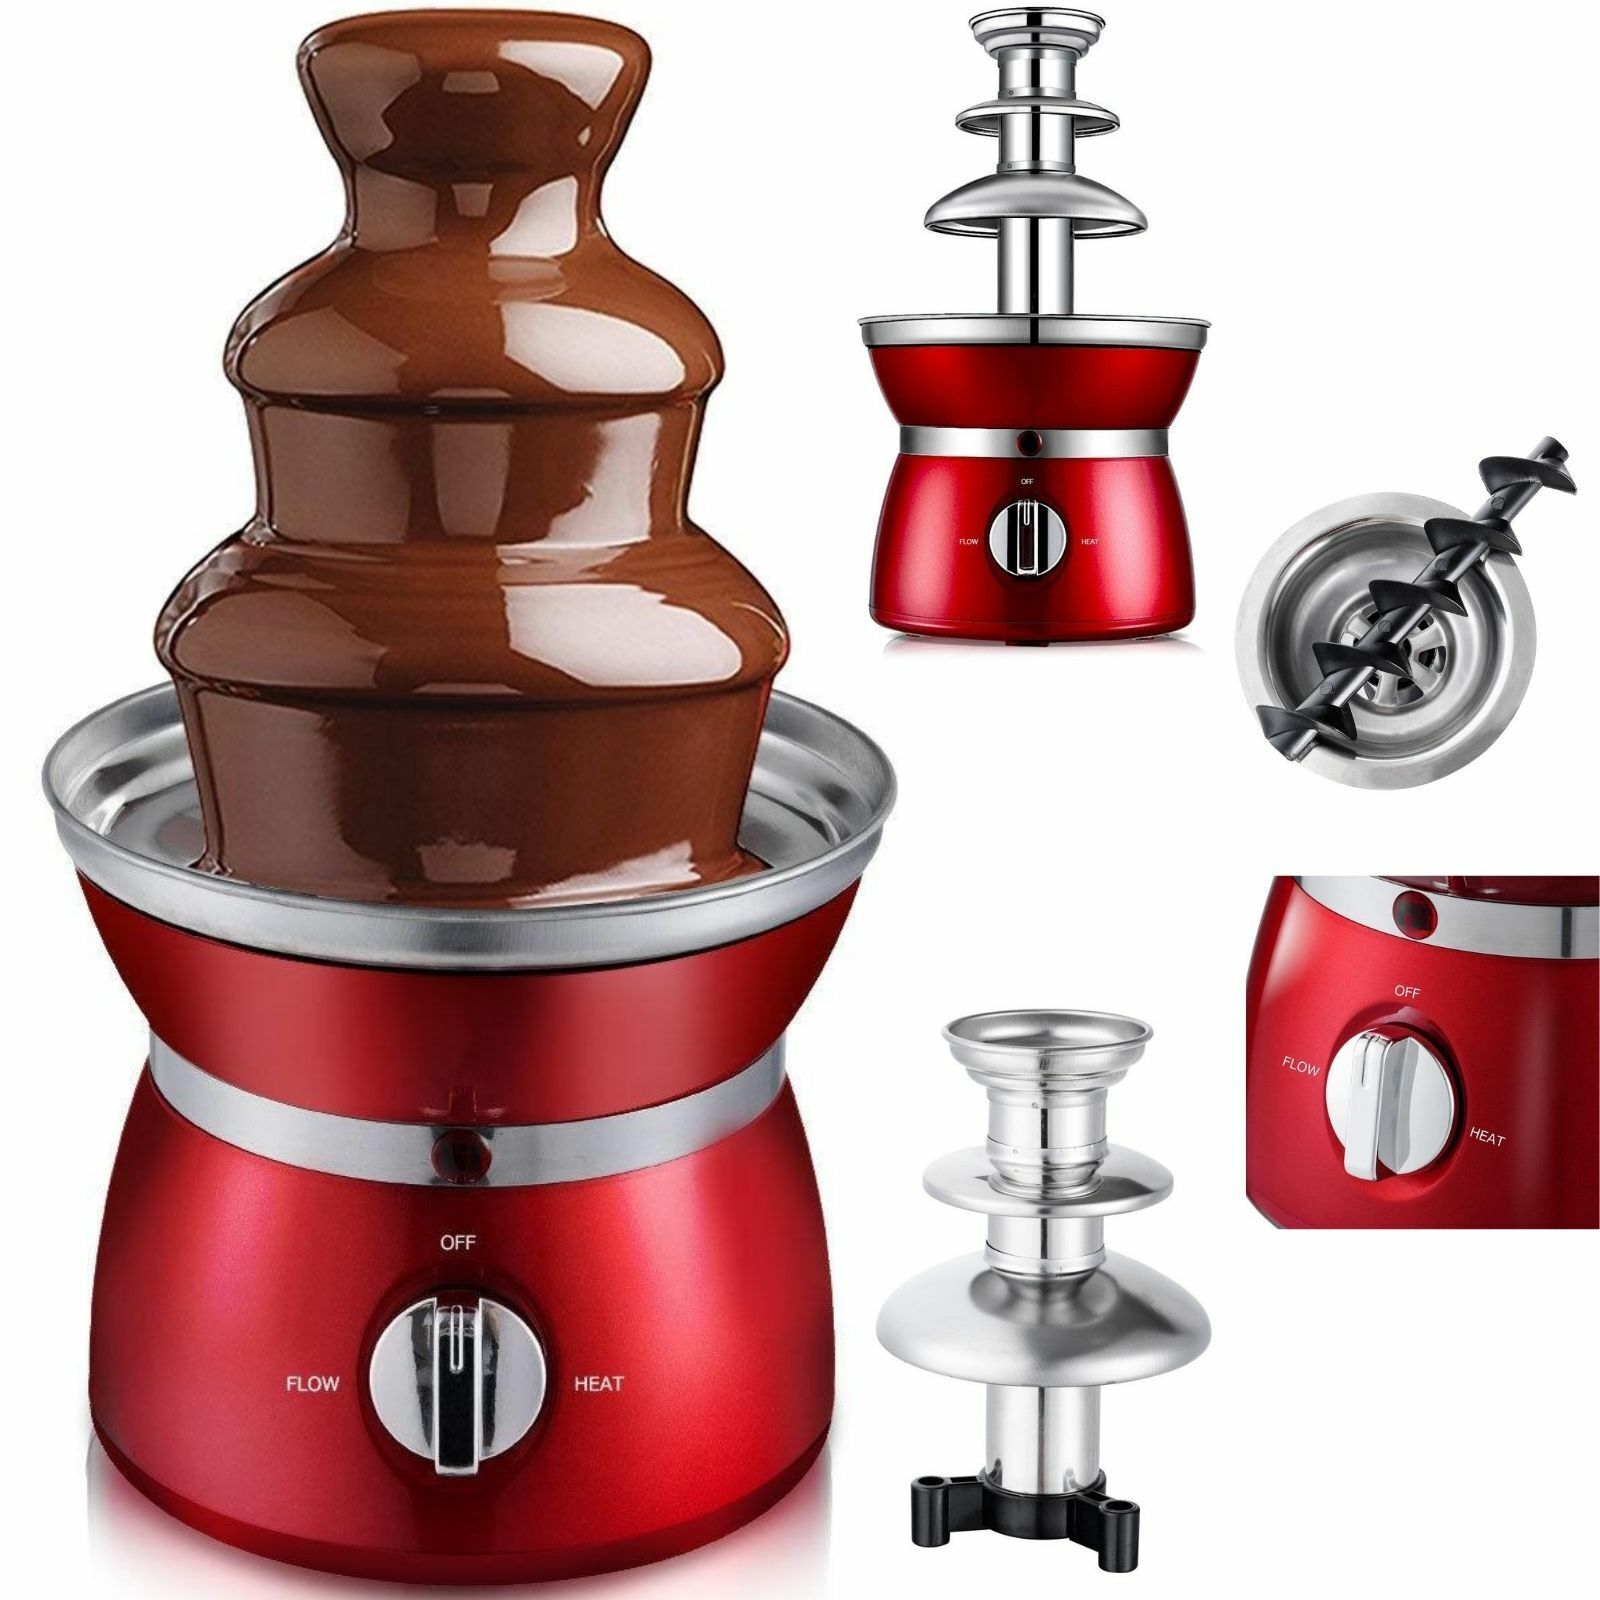 Chocolate Fondue Fountain 3 Tiers Stainless Steel 1.1Lbs Cap